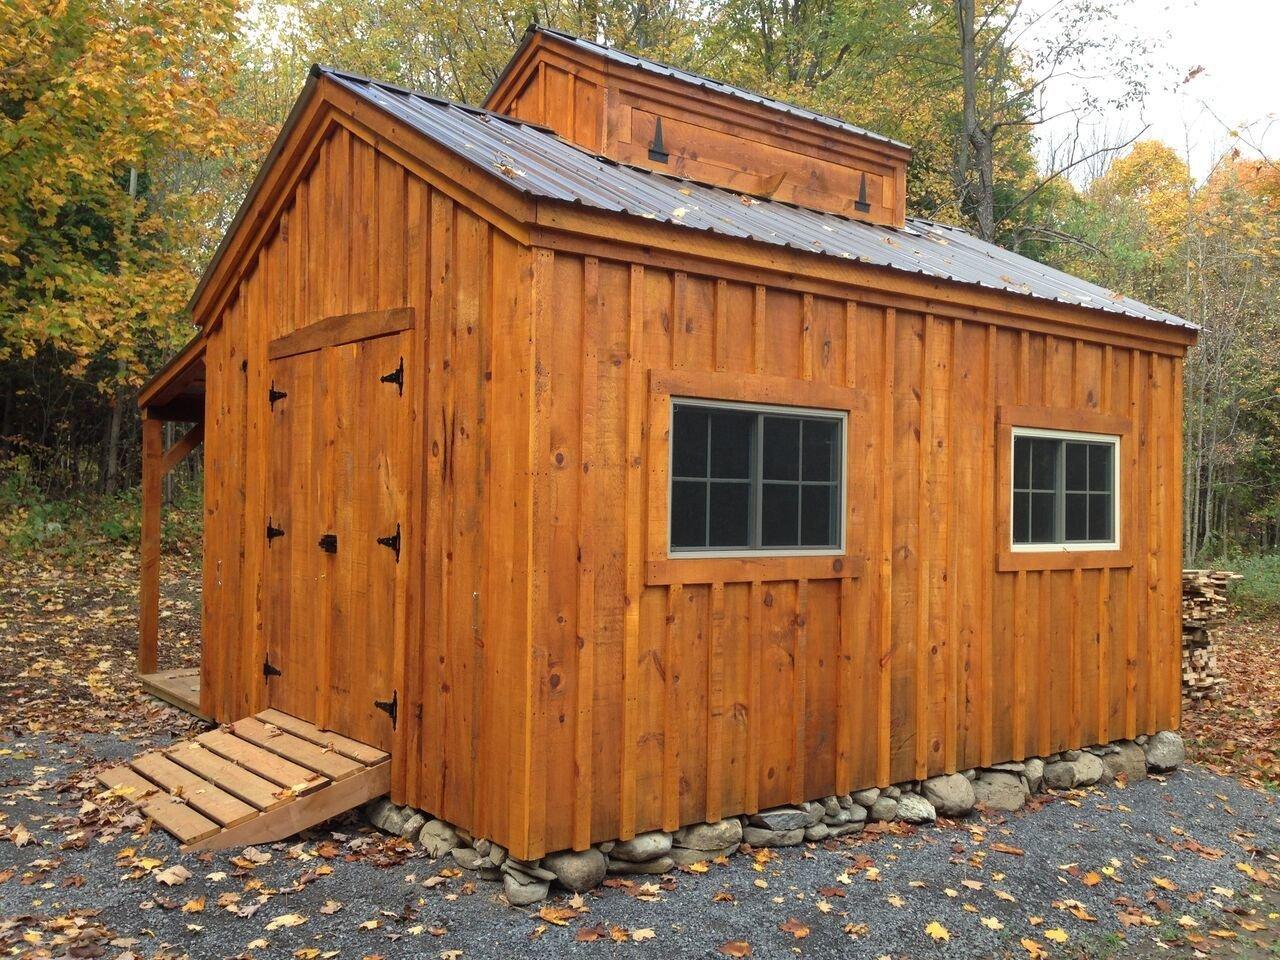 7 East Coast Kit Home Companies | Architecture, Design